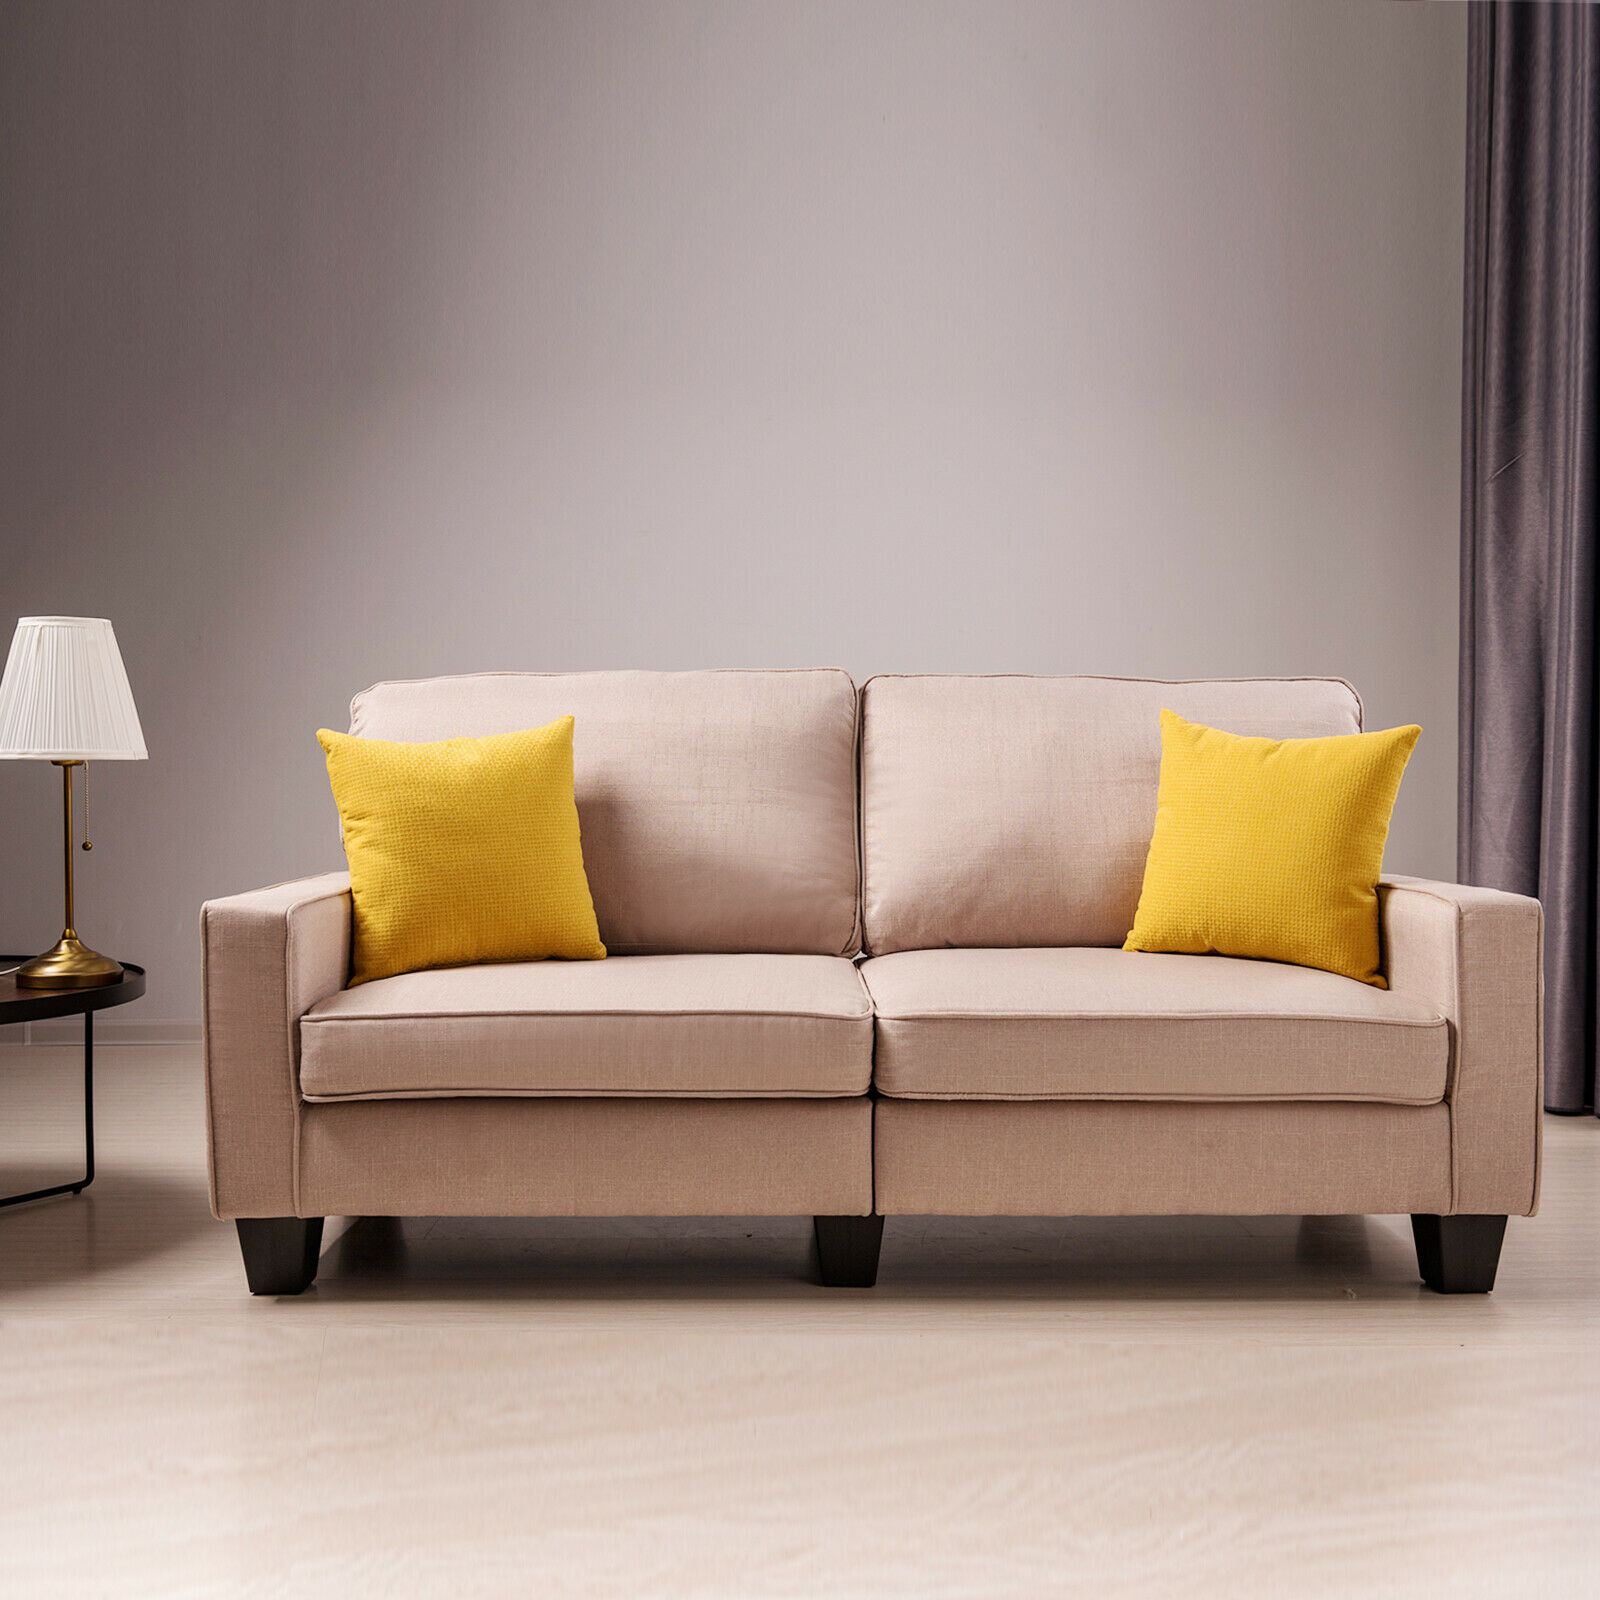 Upholstered Loveseat Sofa Linen Fabric Couch Track Armrest Living Room Furniture